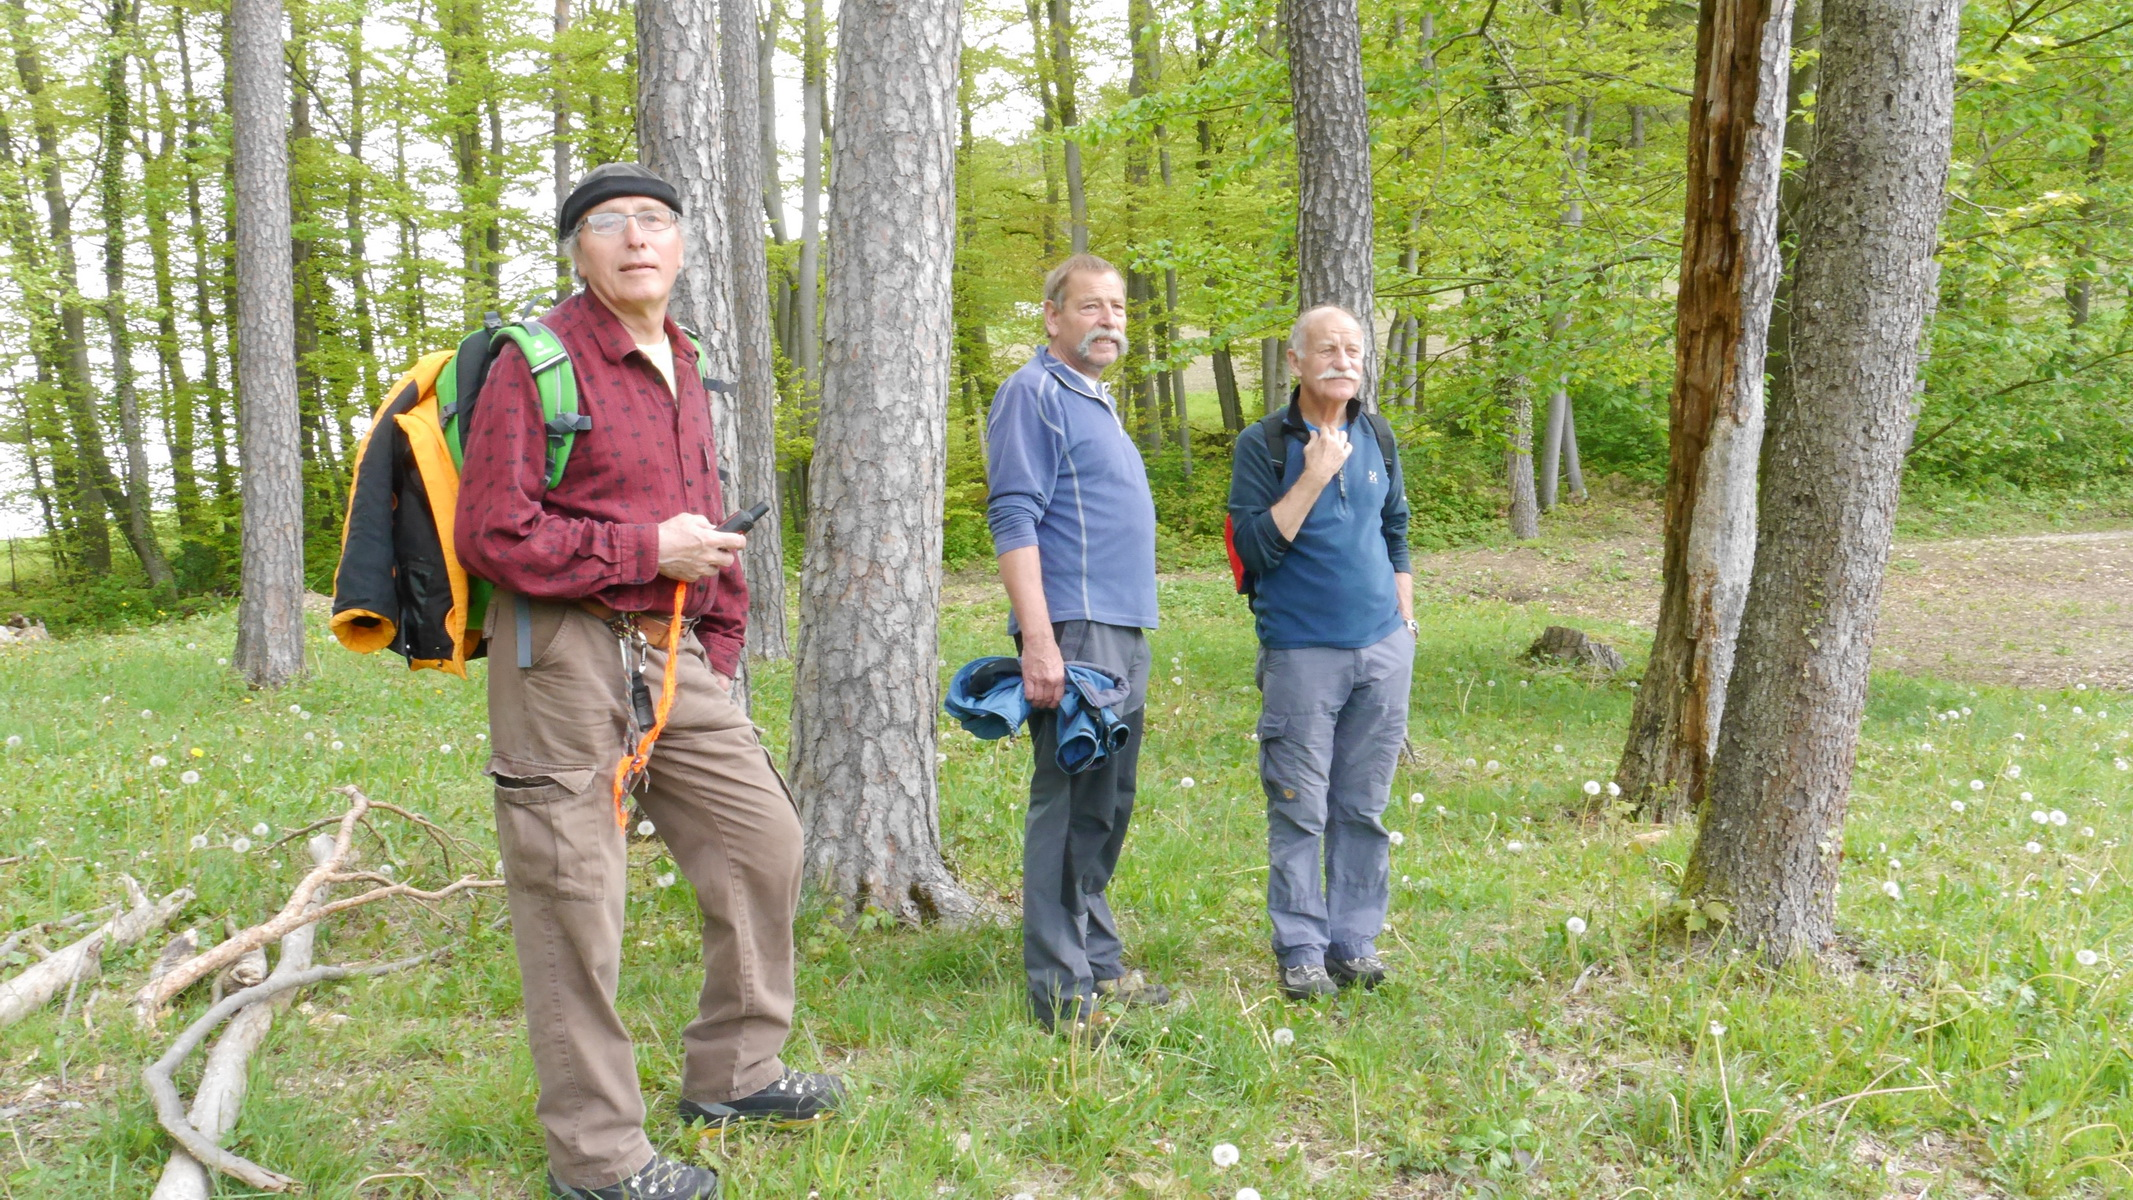 Seniorenwanderung Hersberg - Alpbad Sissach 04.05.2017